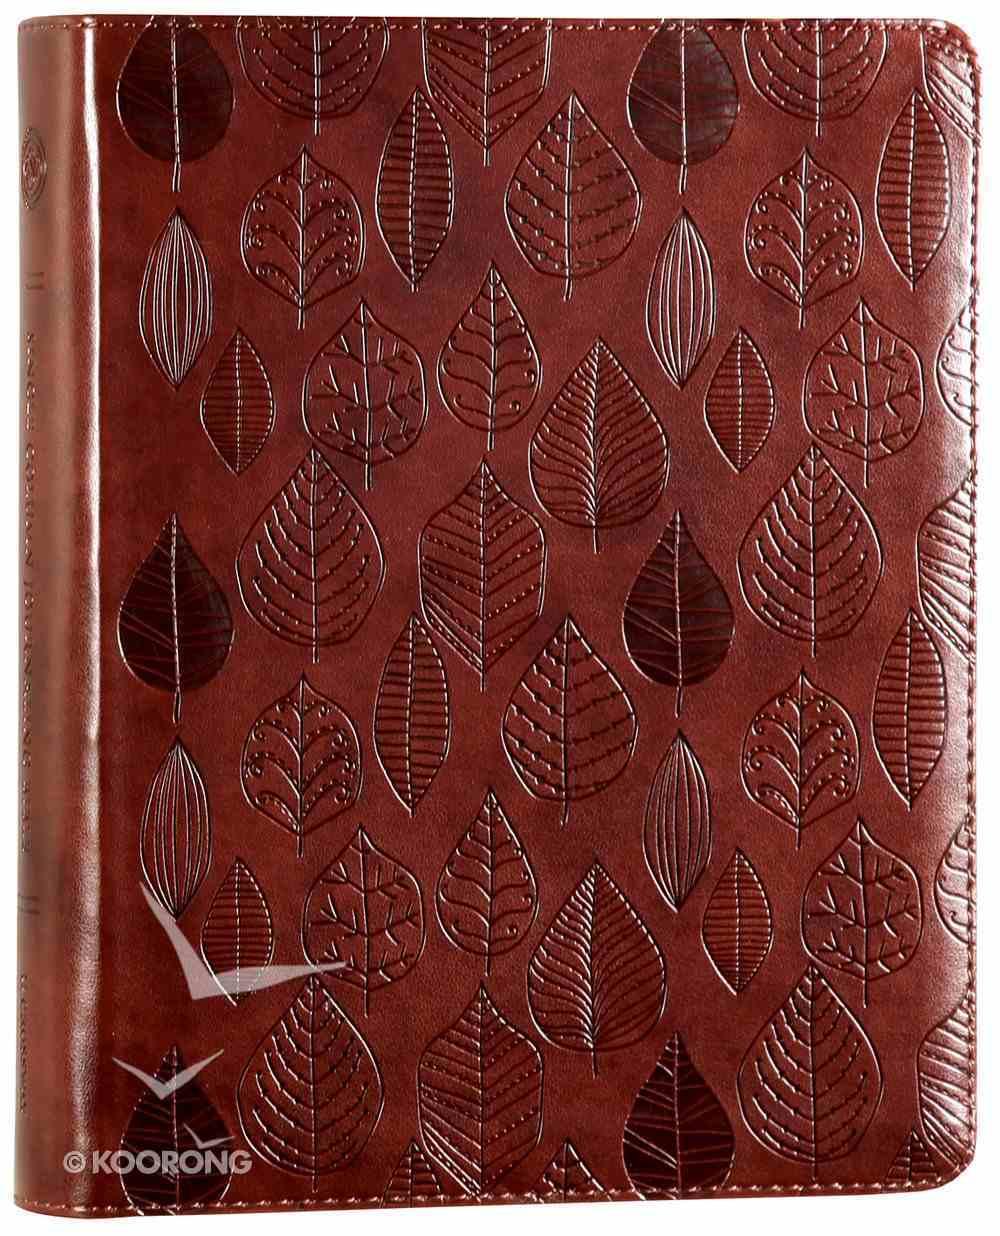 ESV Single Column Journaling Bible Chestnut Leaves (Black Letter Edition) Imitation Leather